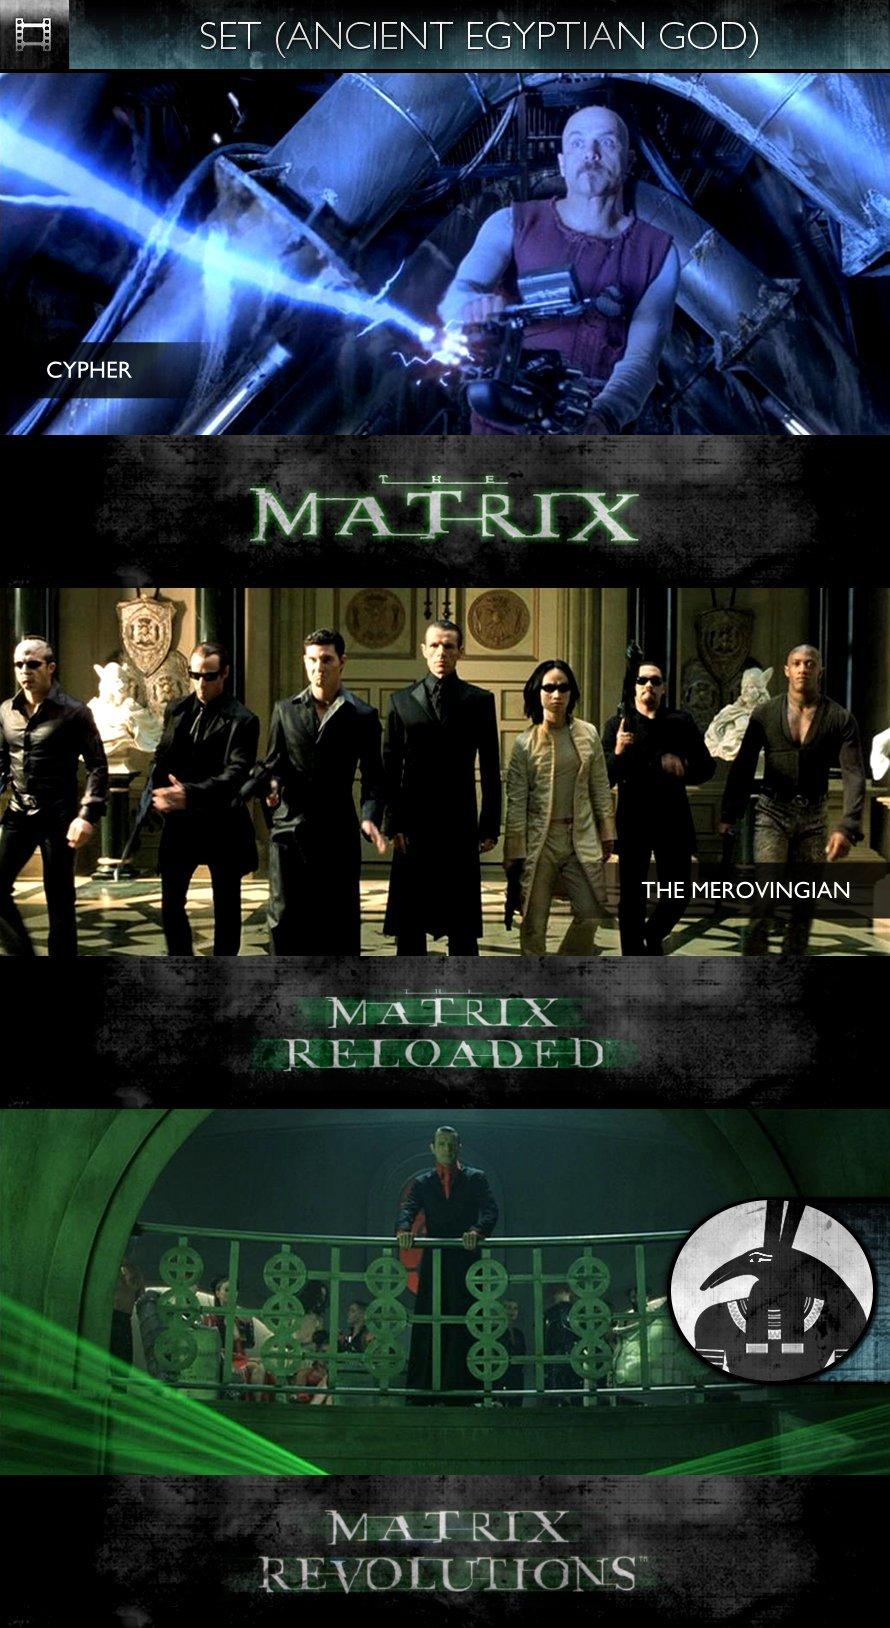 SET - The Matrix Trilogy (1999-2003) - Cypher & The Merovingian